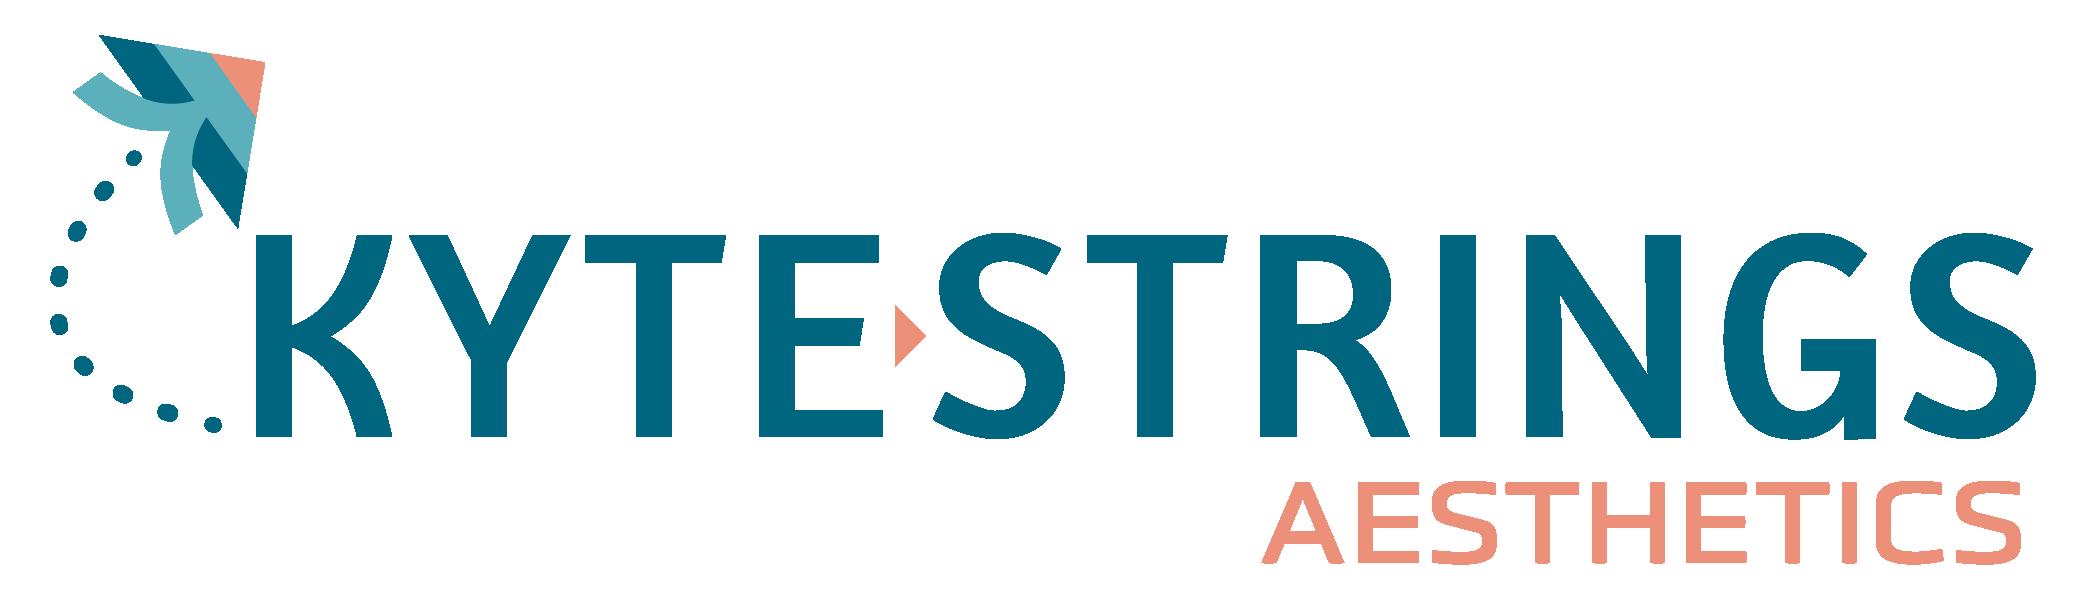 KyteStrings Digital | Top B2C Marketing Agency | SEO Experts